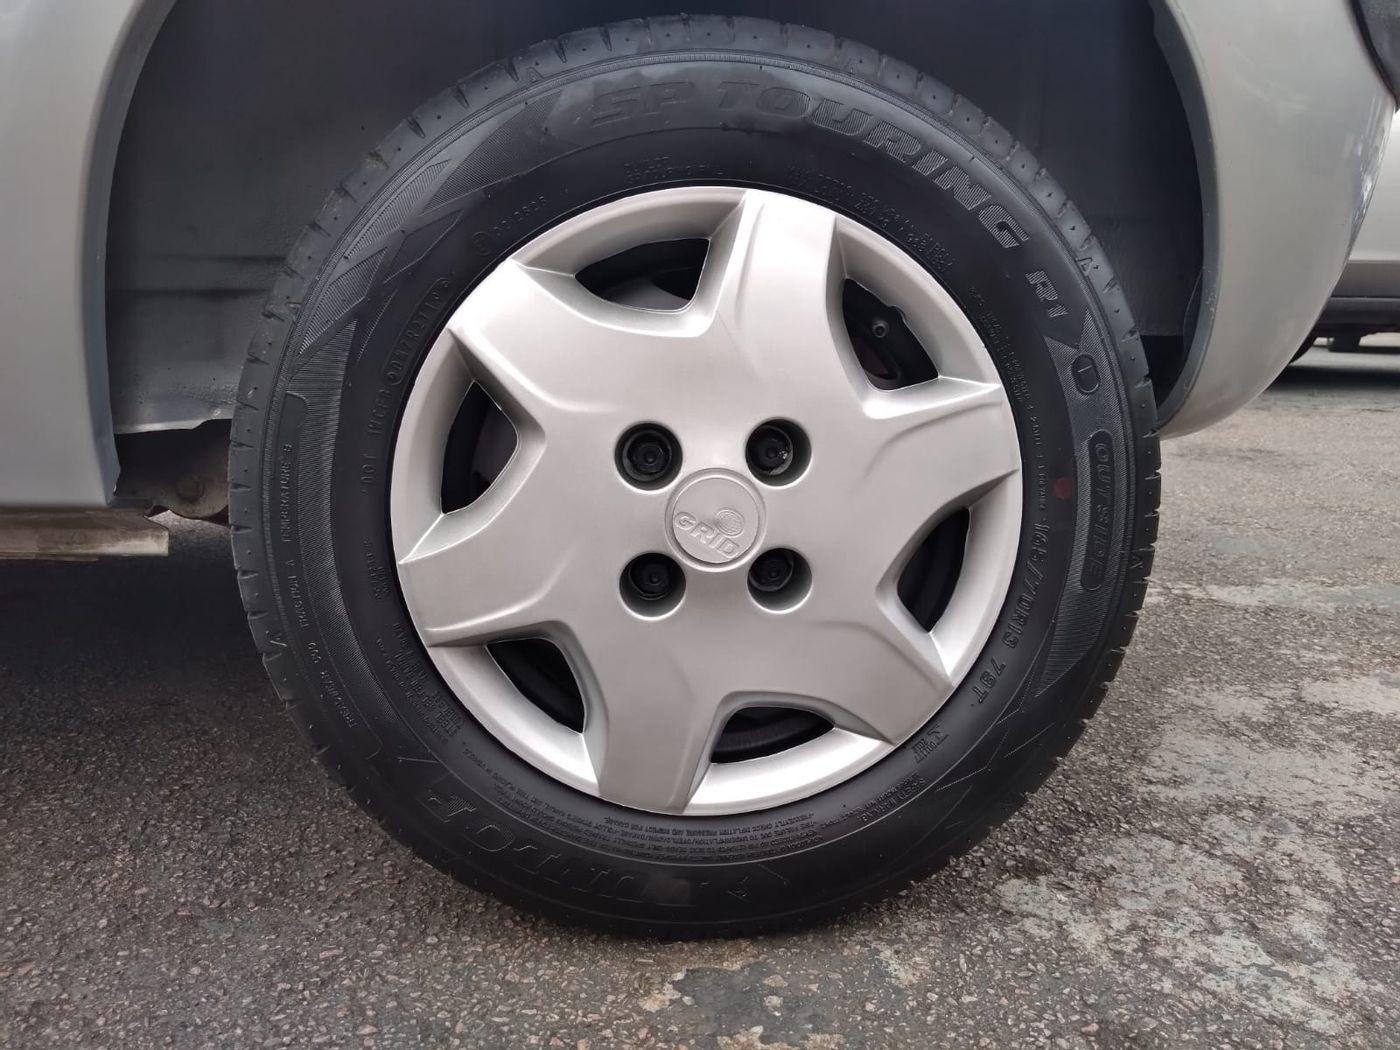 Chevrolet Celta 1.4/ Super/ Energy 1.4 8V 85cv 5p